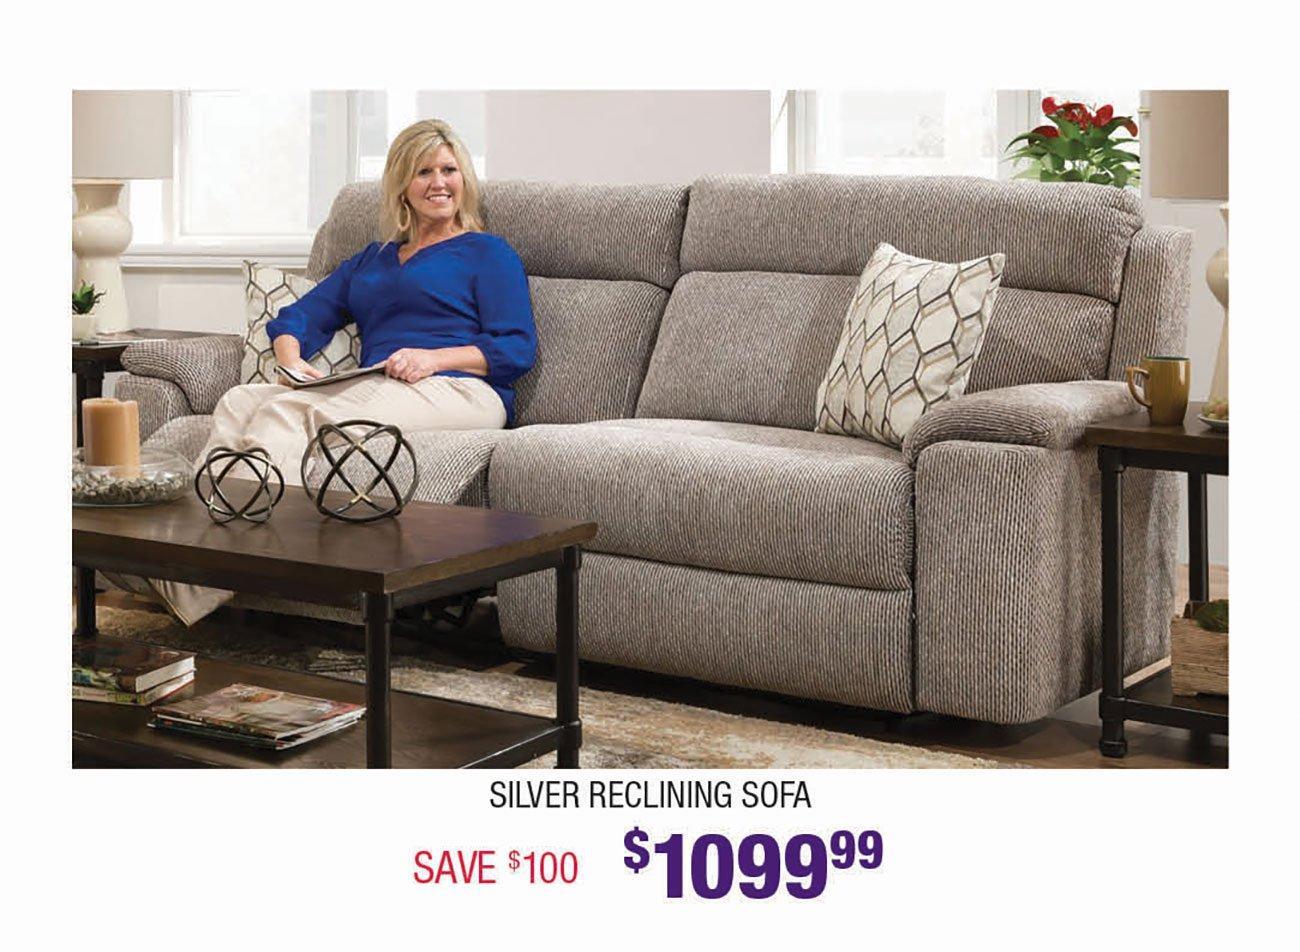 Silver-Reclining-Sofa